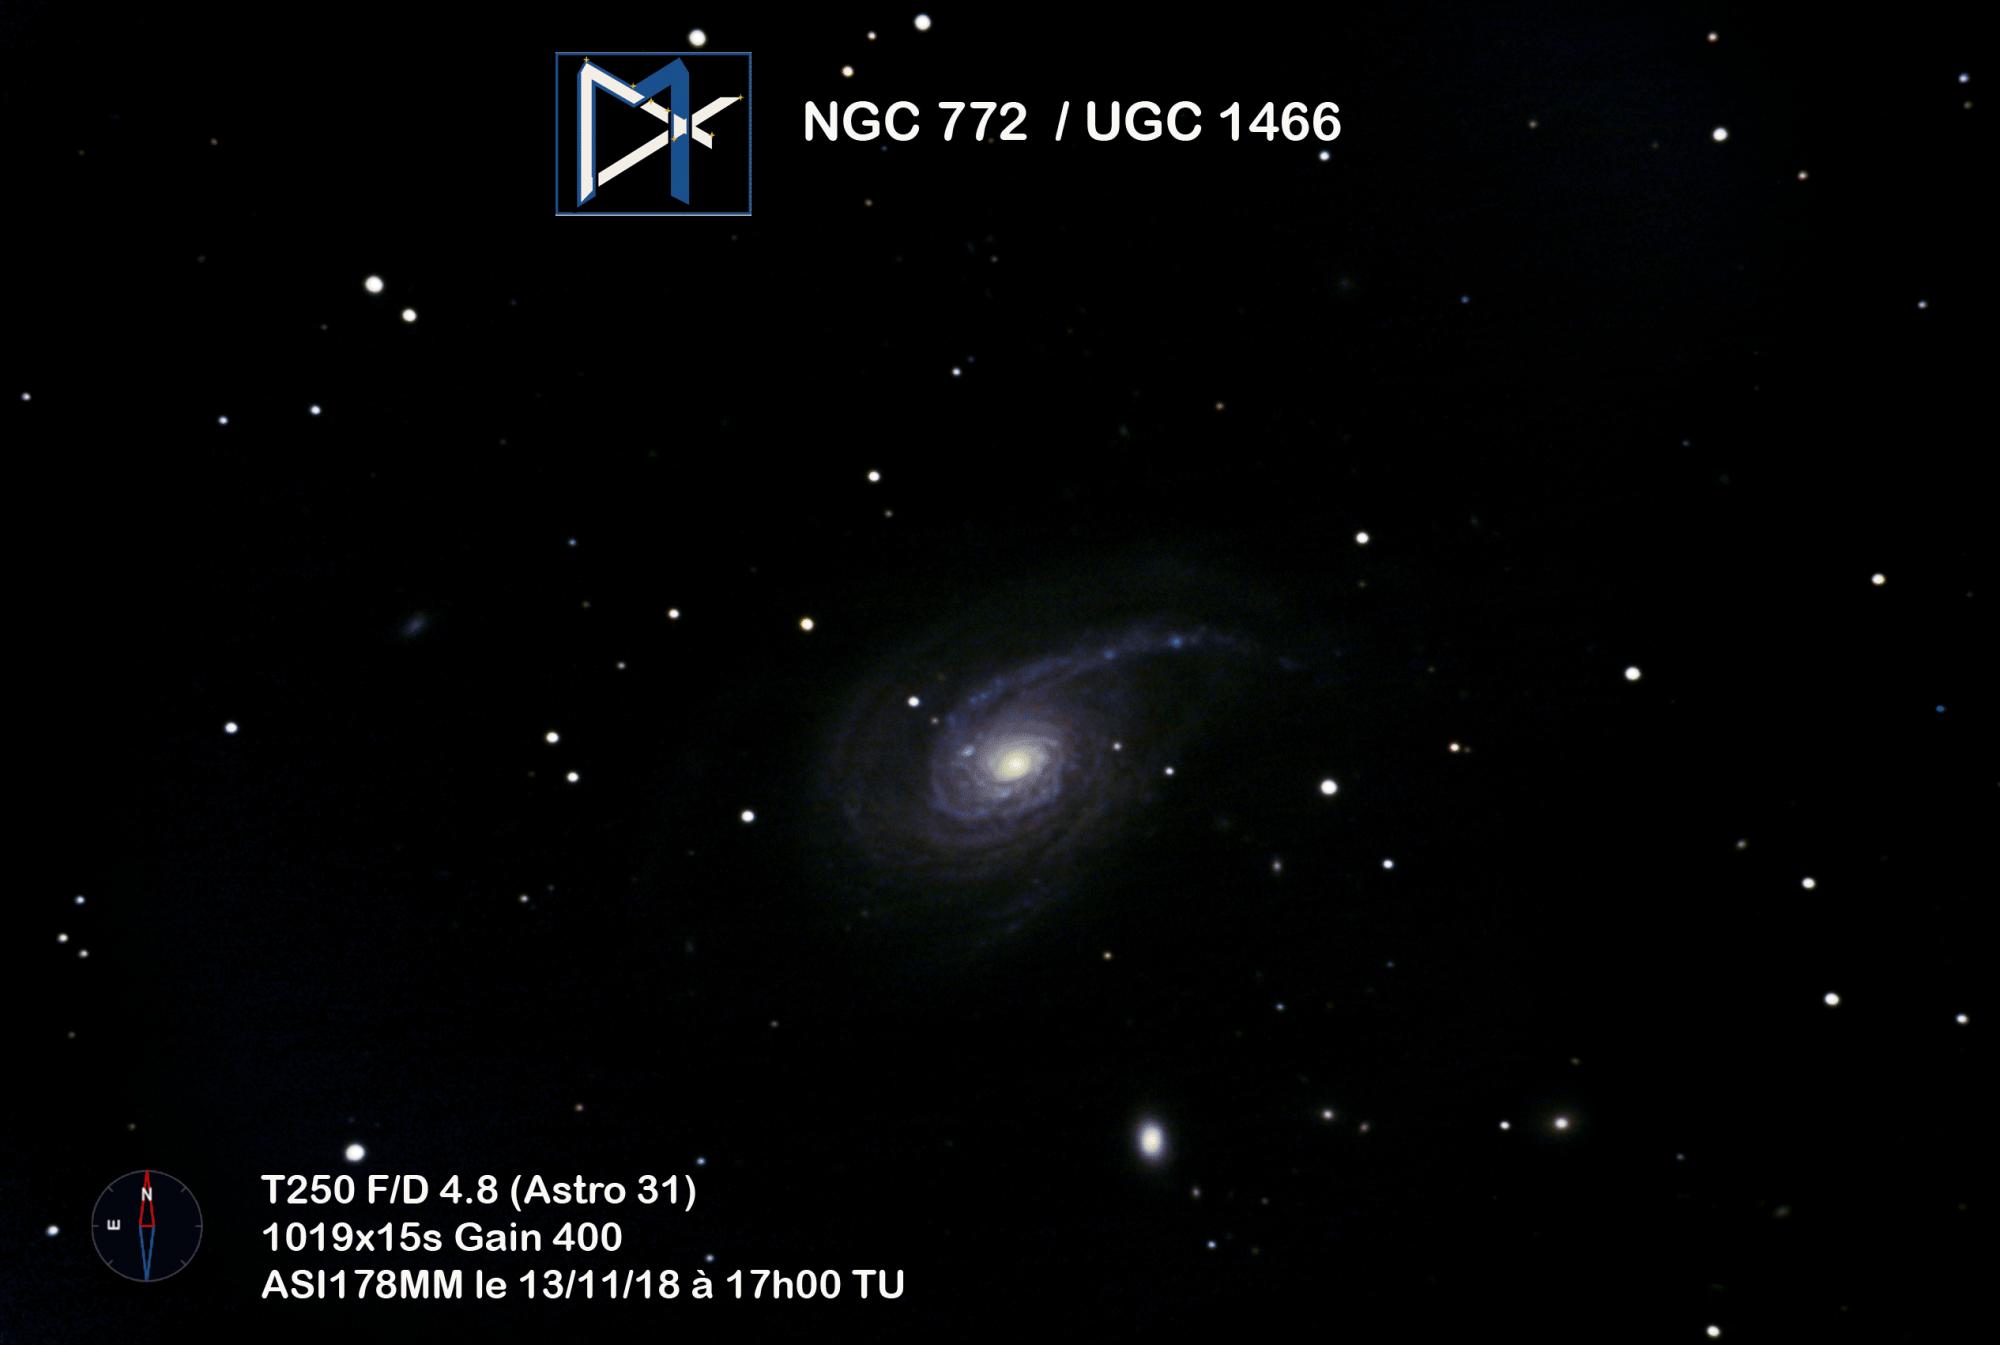 NGC-772-Couleur.thumb.png.0e523cc774844002c956dbad2ccfa385.png